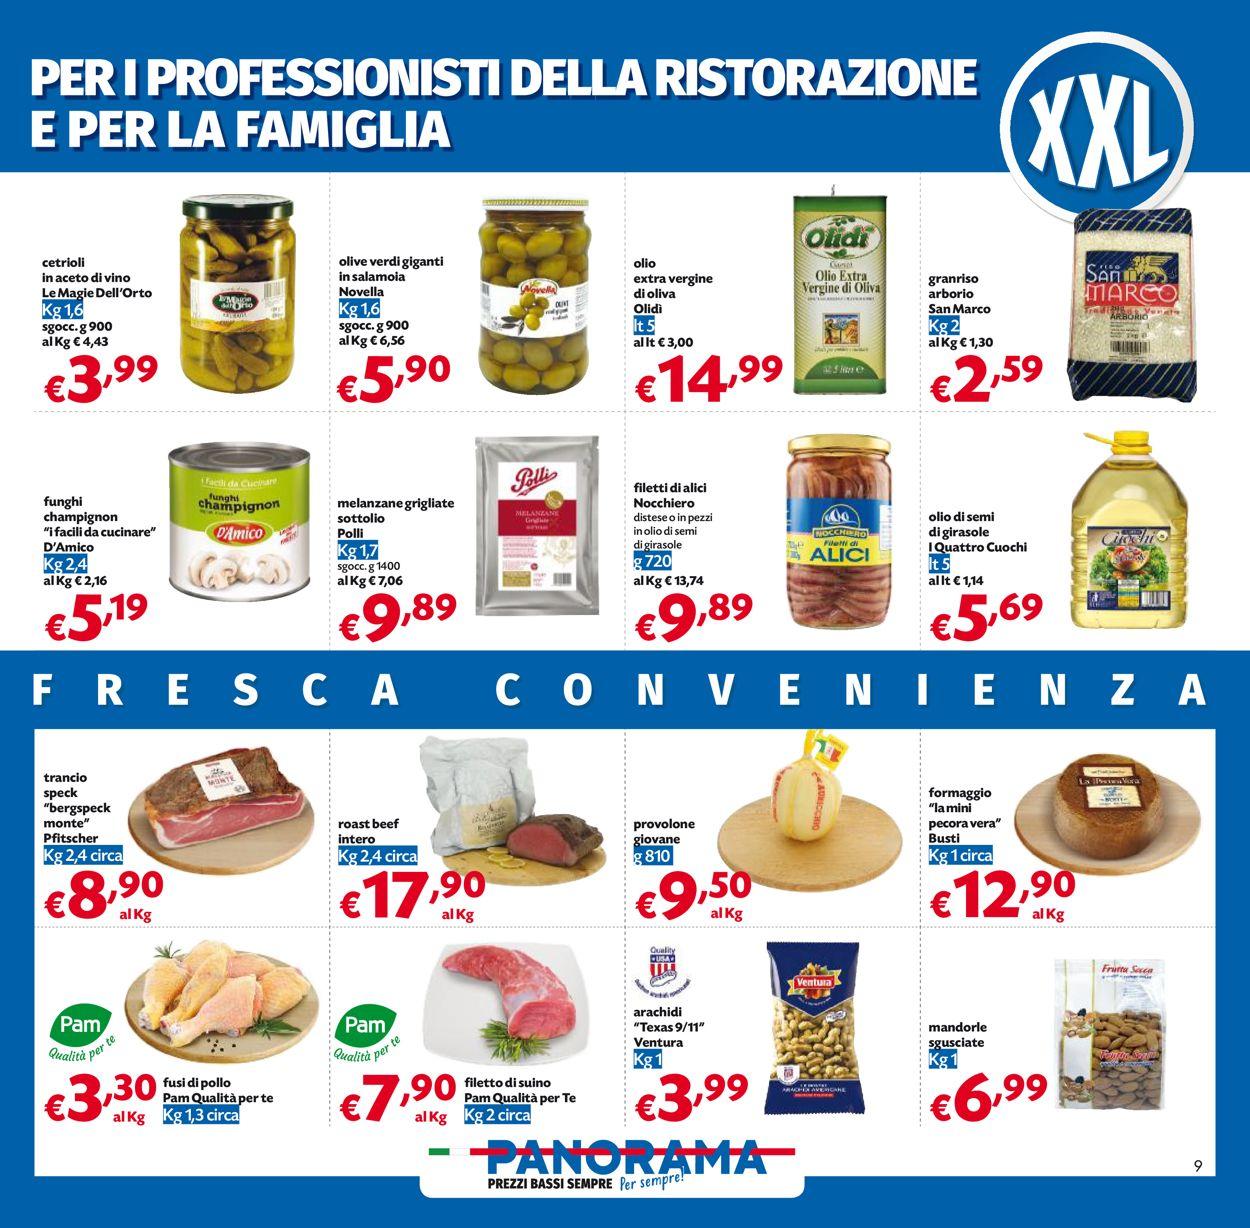 Volantino Pam Panorama - Offerte 14/01-27/01/2021 (Pagina 9)